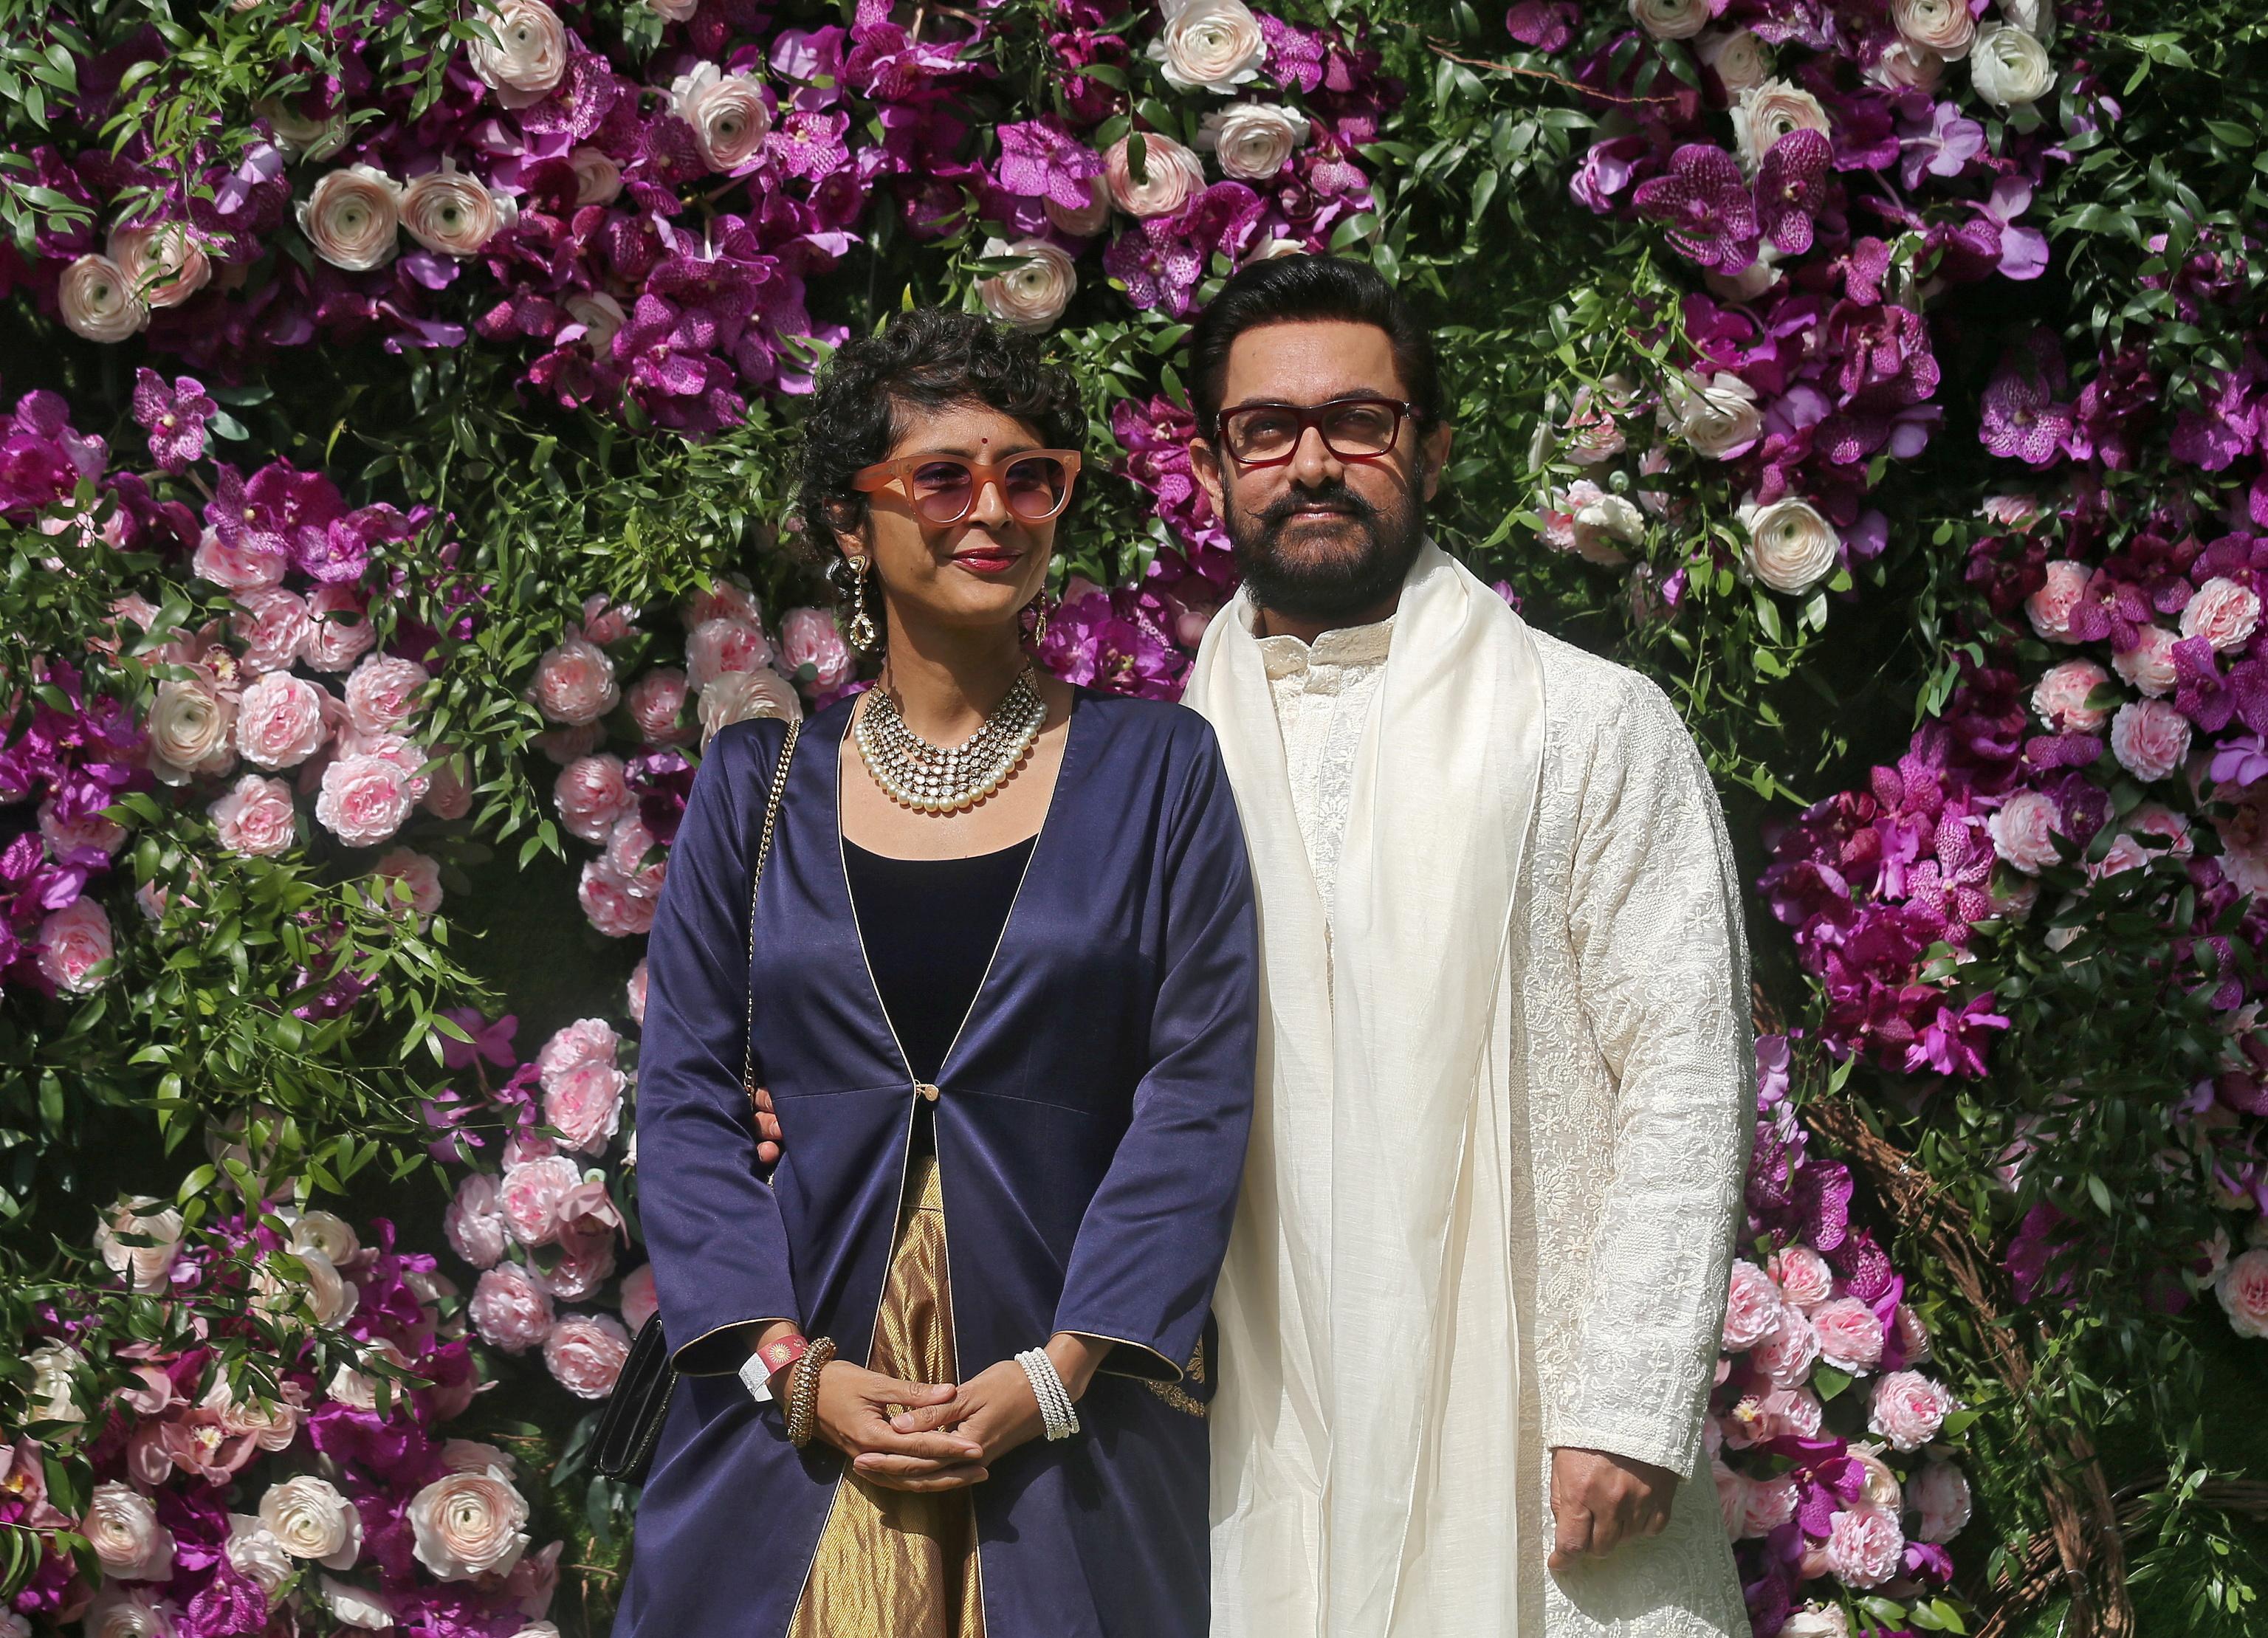 Aamir Khan y su hasta ahora esposa, Kiran Rao.